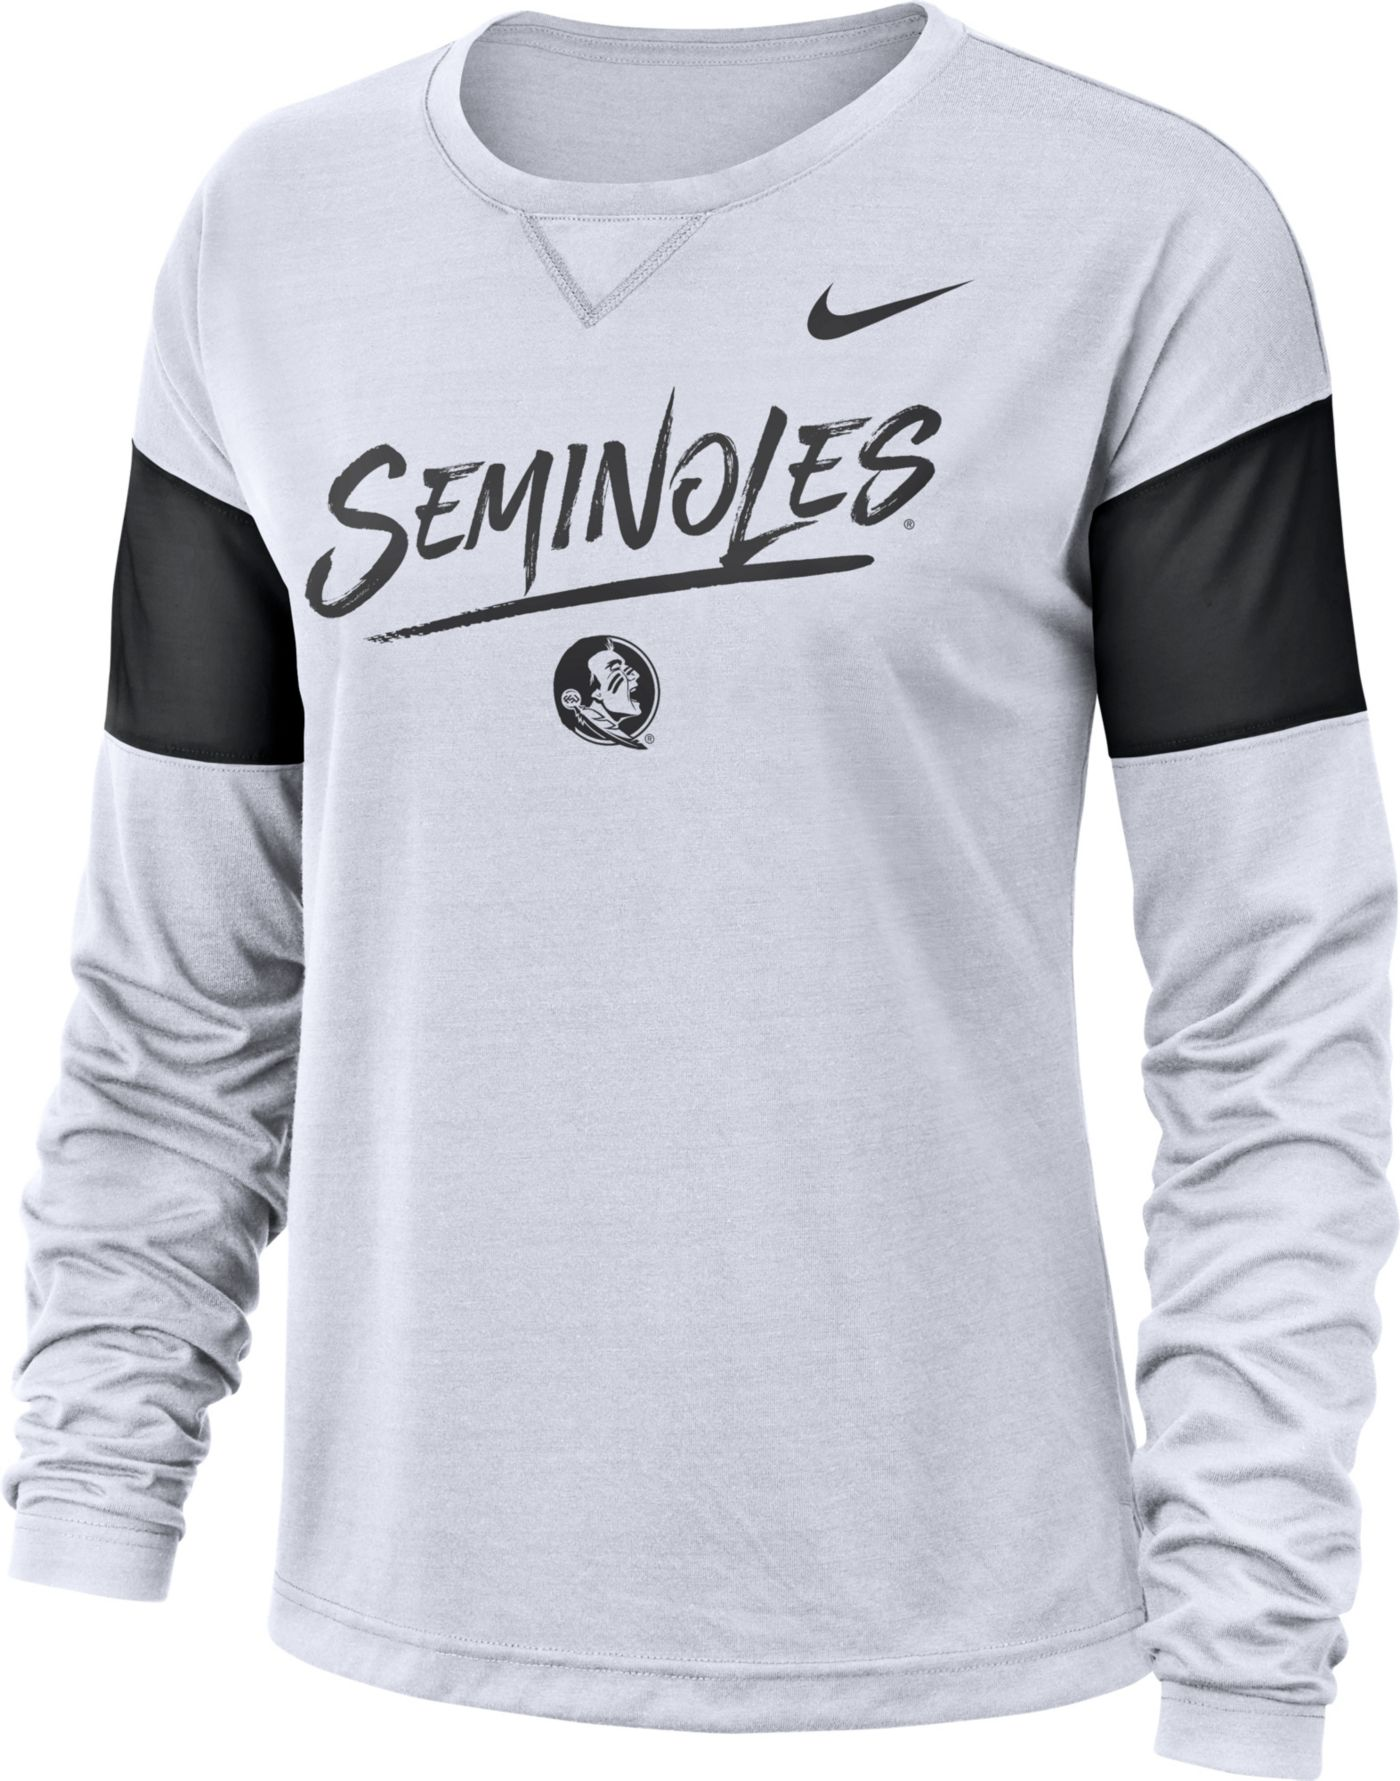 Nike Women's Florida State Seminoles Dri-FIT Breathe Long Sleeve White T-Shirt